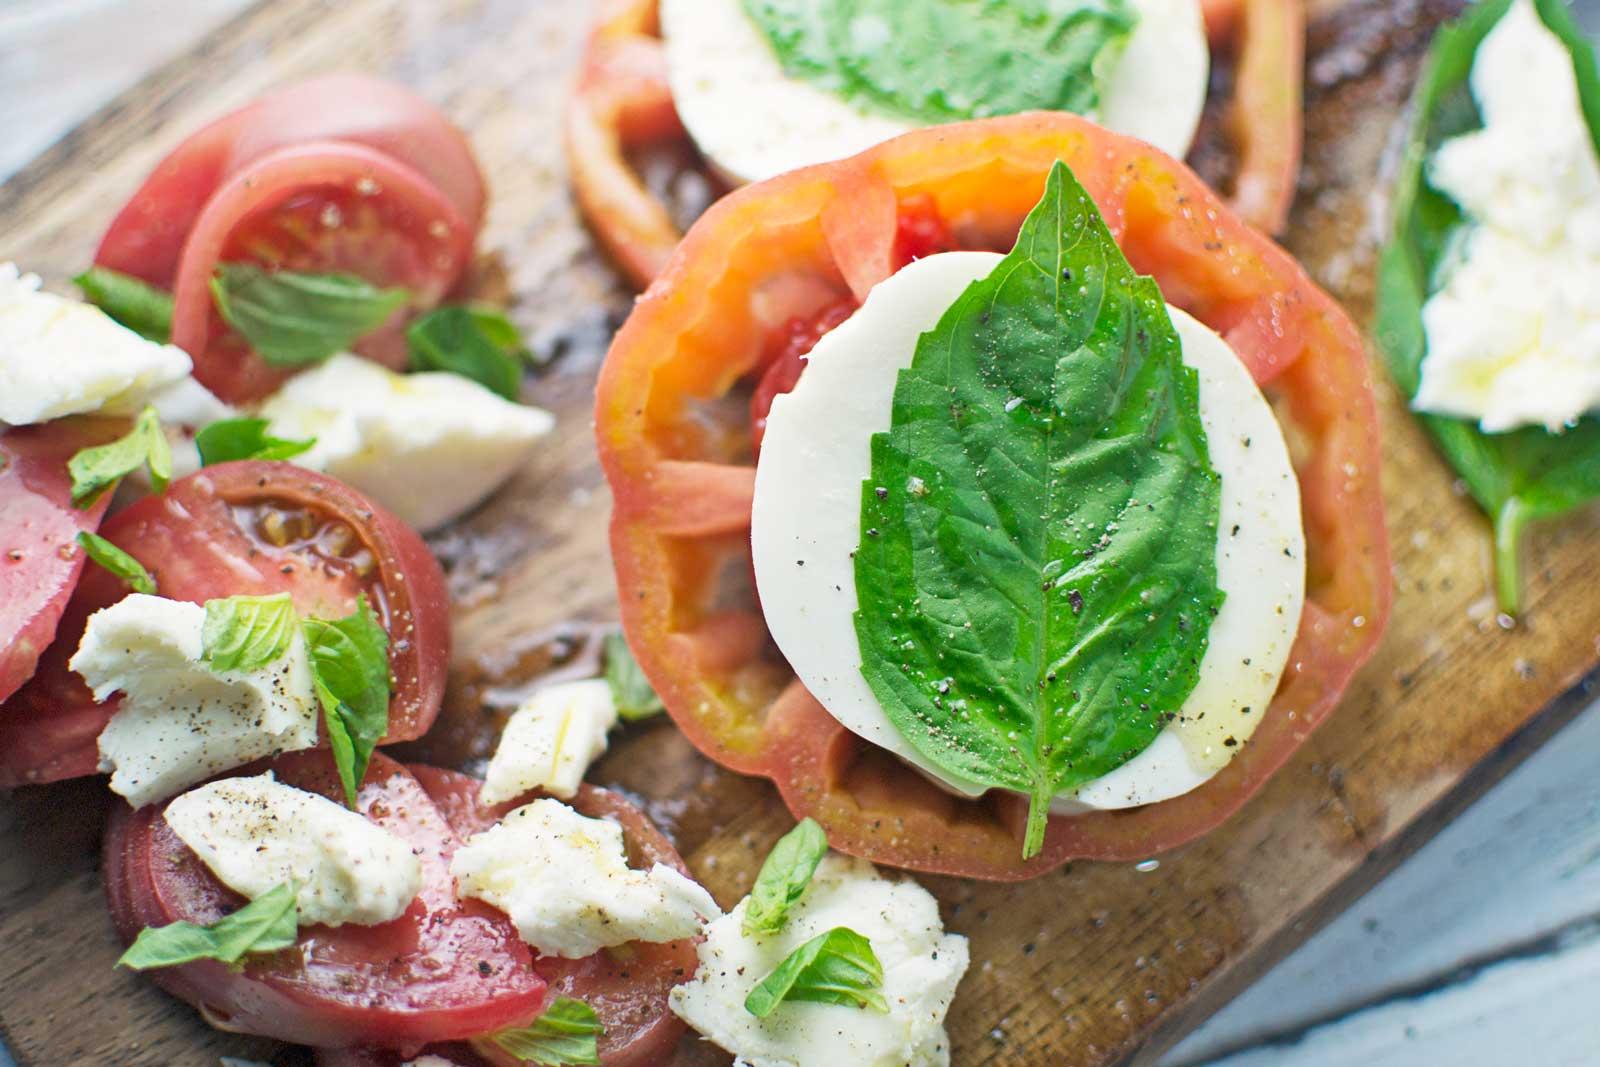 Classic Caprese Salad - #Salad - @LittleFiggyFood